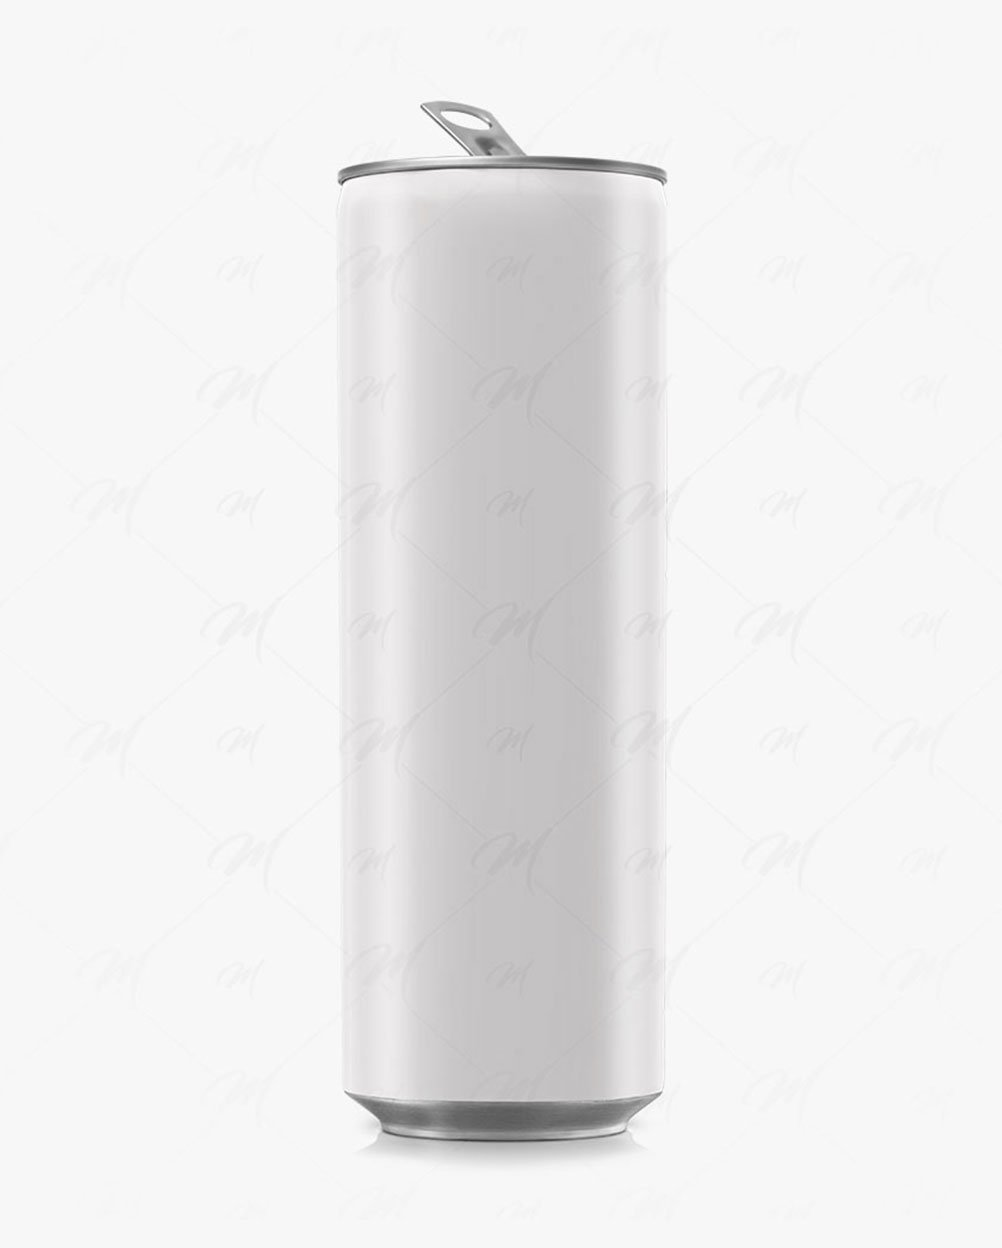 lata de energético mockup PSD